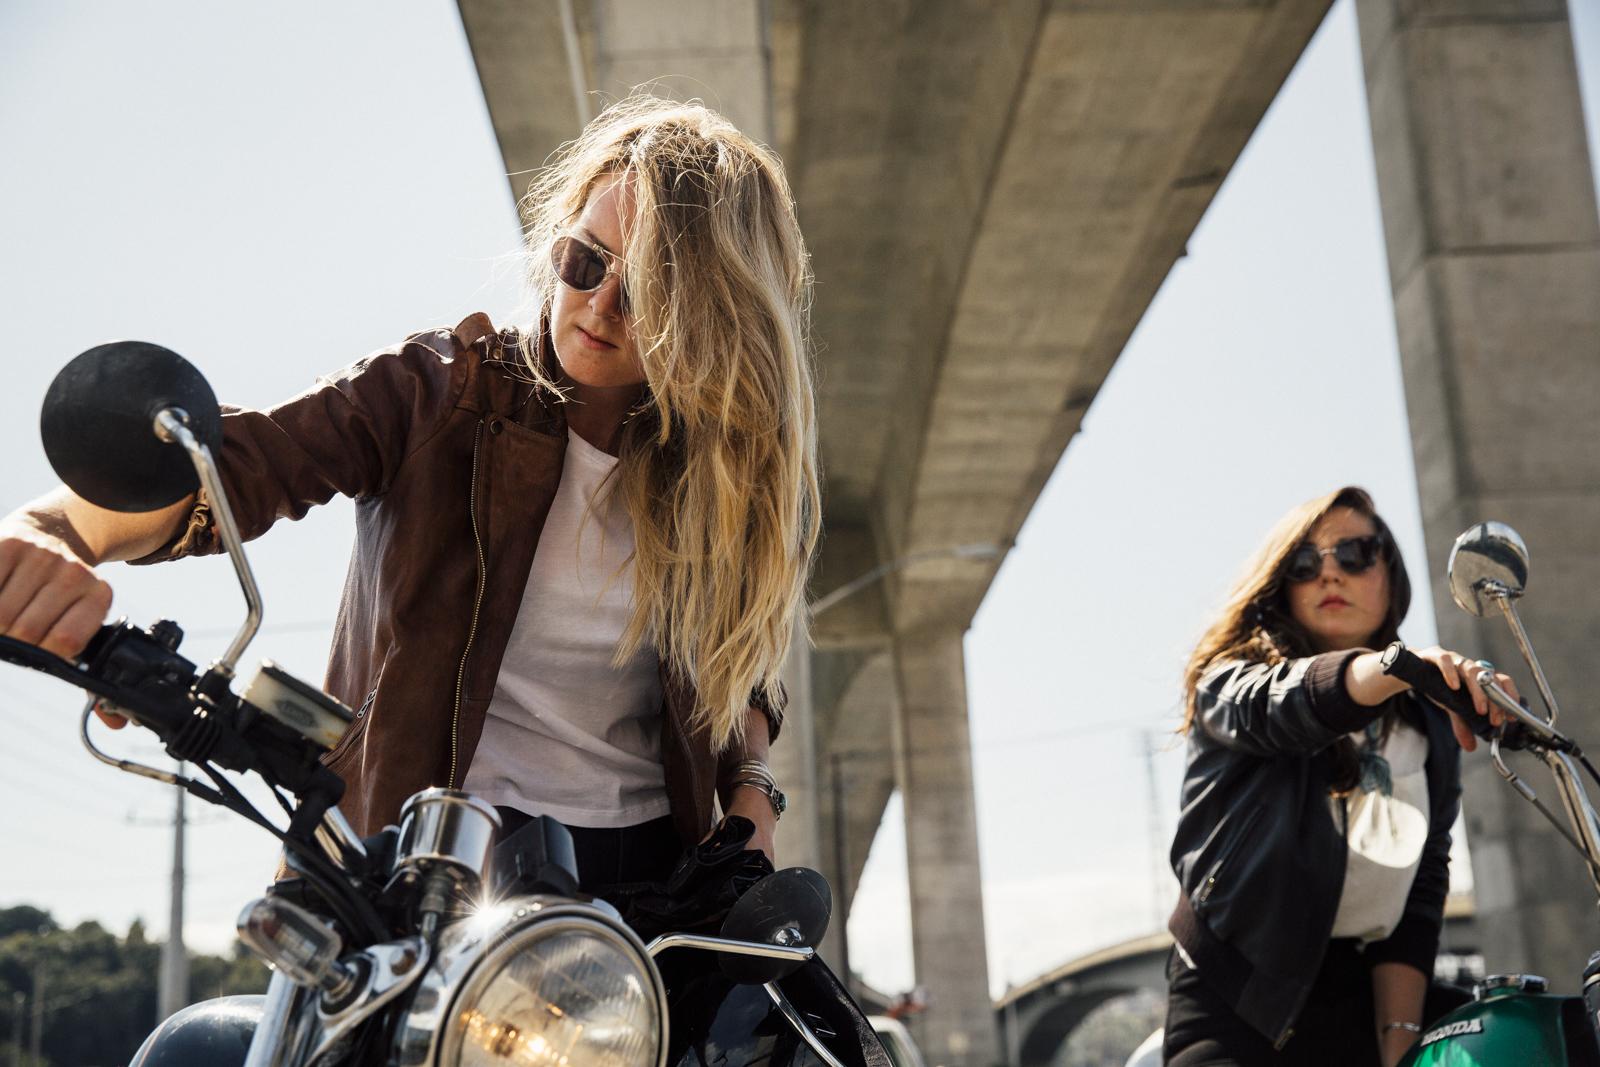 motogirls_6.jpg